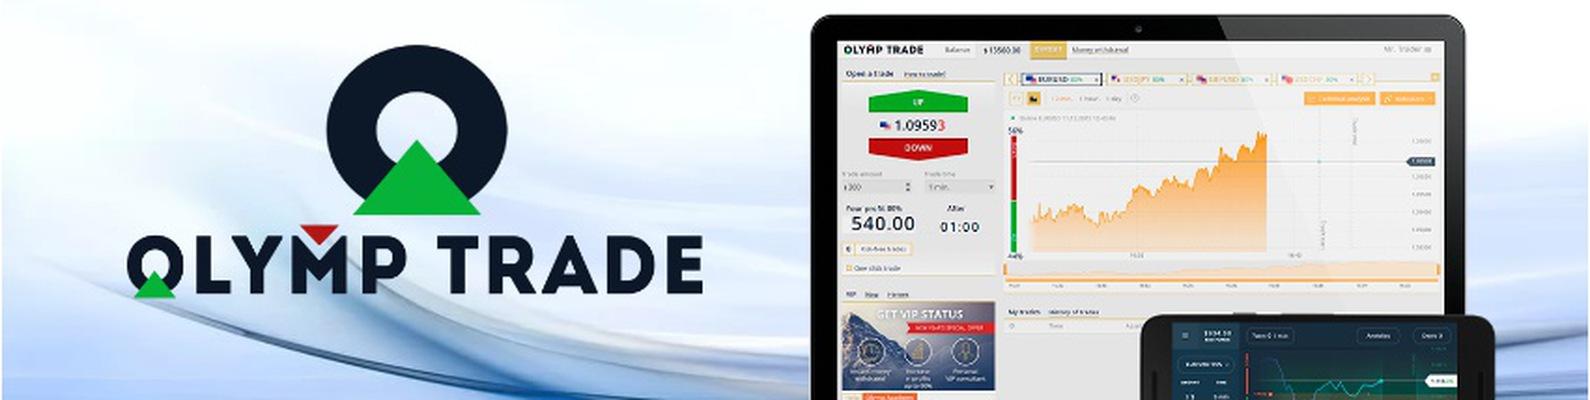 Бинарные опционы заработок olymp trade